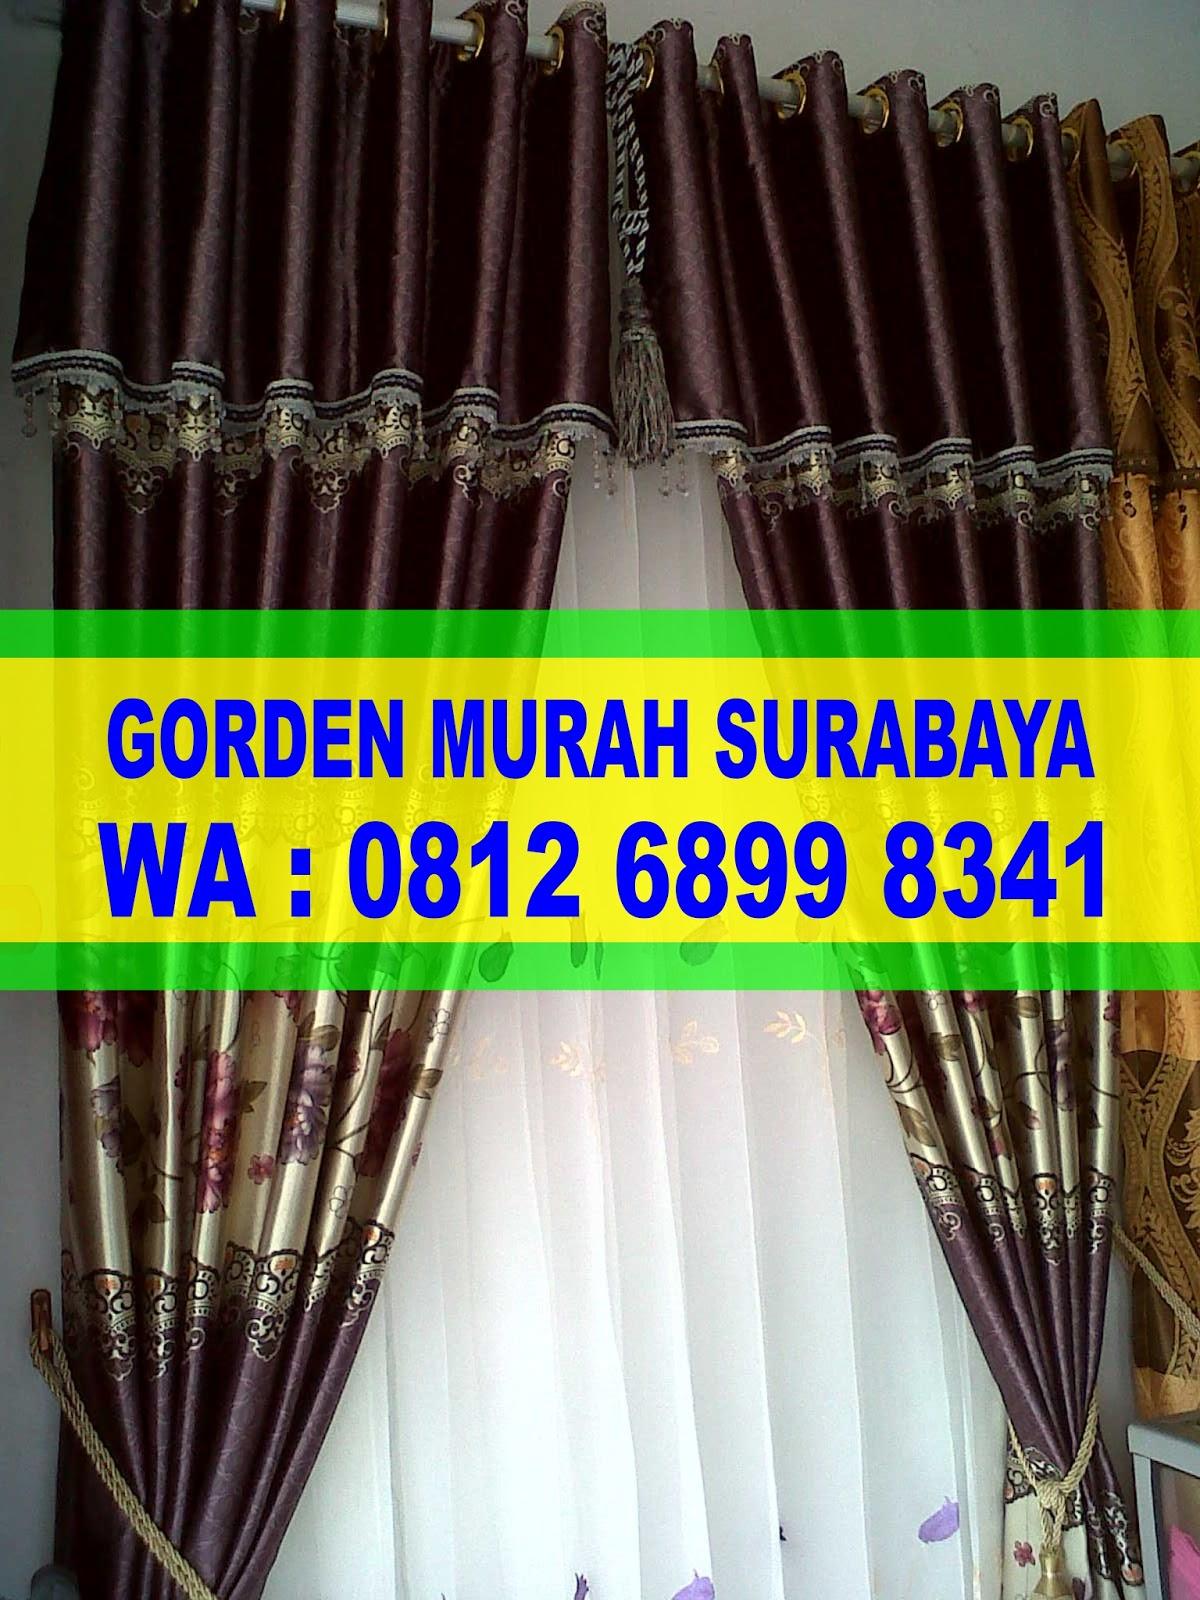 Gorden Murah Surabaya Jual Wilayah Karakter Frozen Golden State Warriors Staupitz Birkenweg 1 Gordon Street Garbutt Xing Hendersonville Tn Gallatin